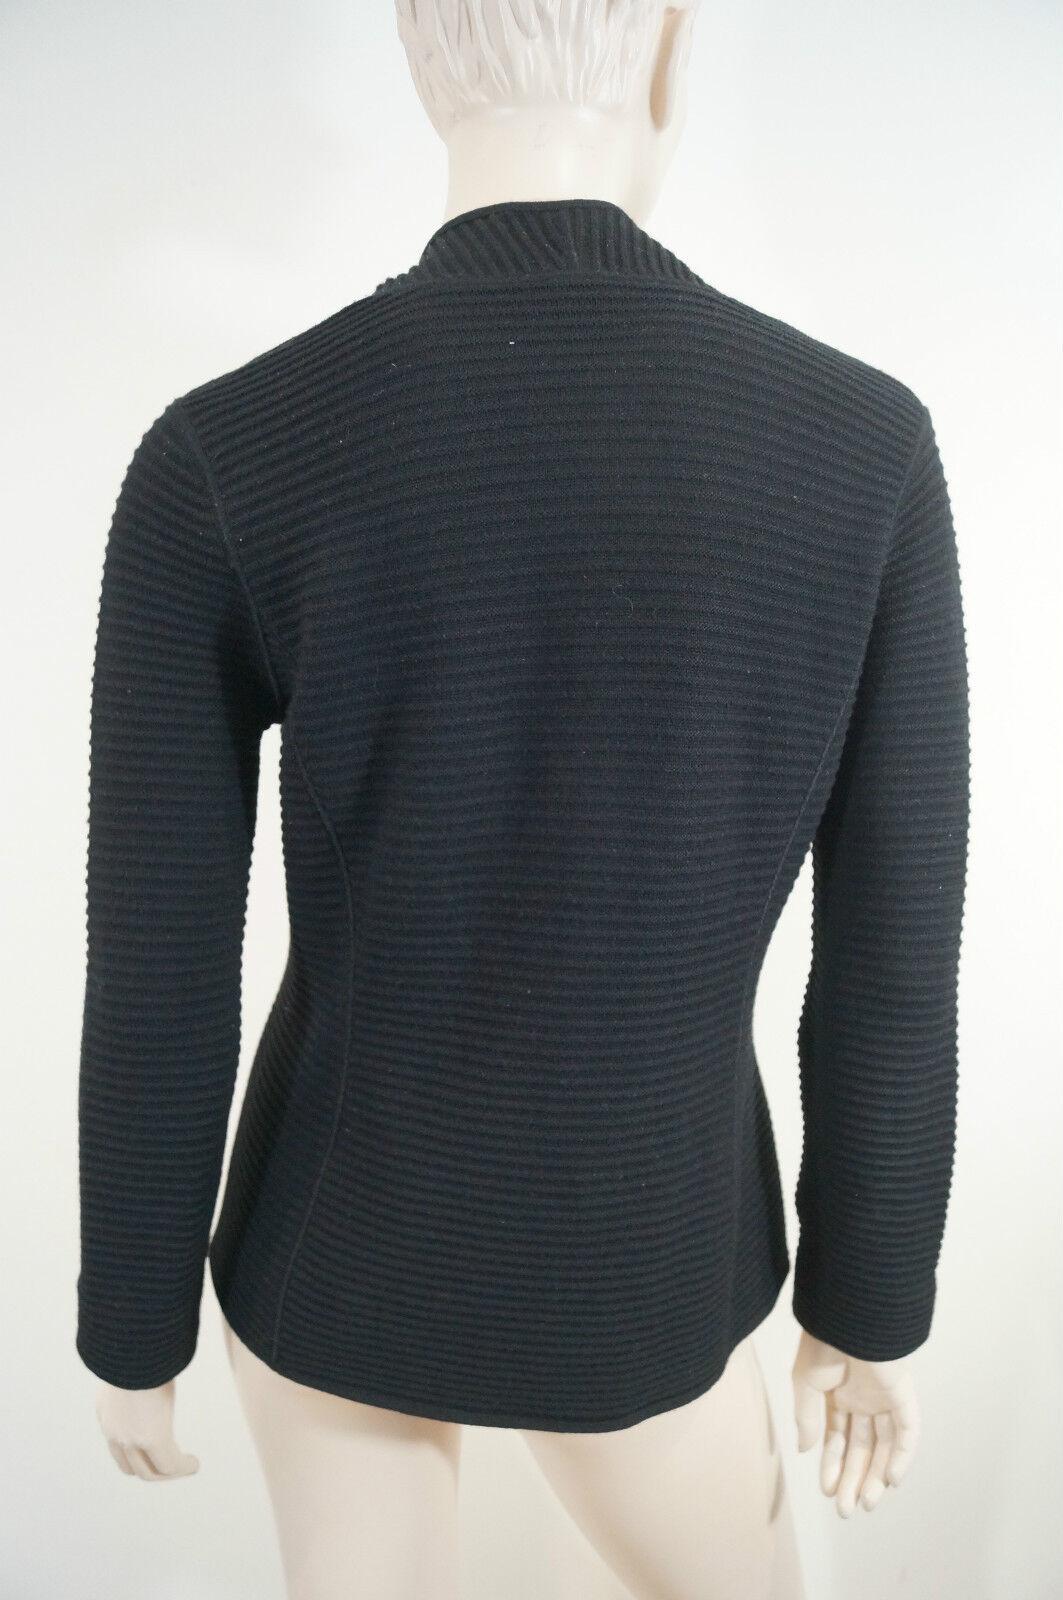 Adriano oroschmied NEW rosso Uomo Size Shirt Medium M Button Down Shirt Size  188  557 c717c6